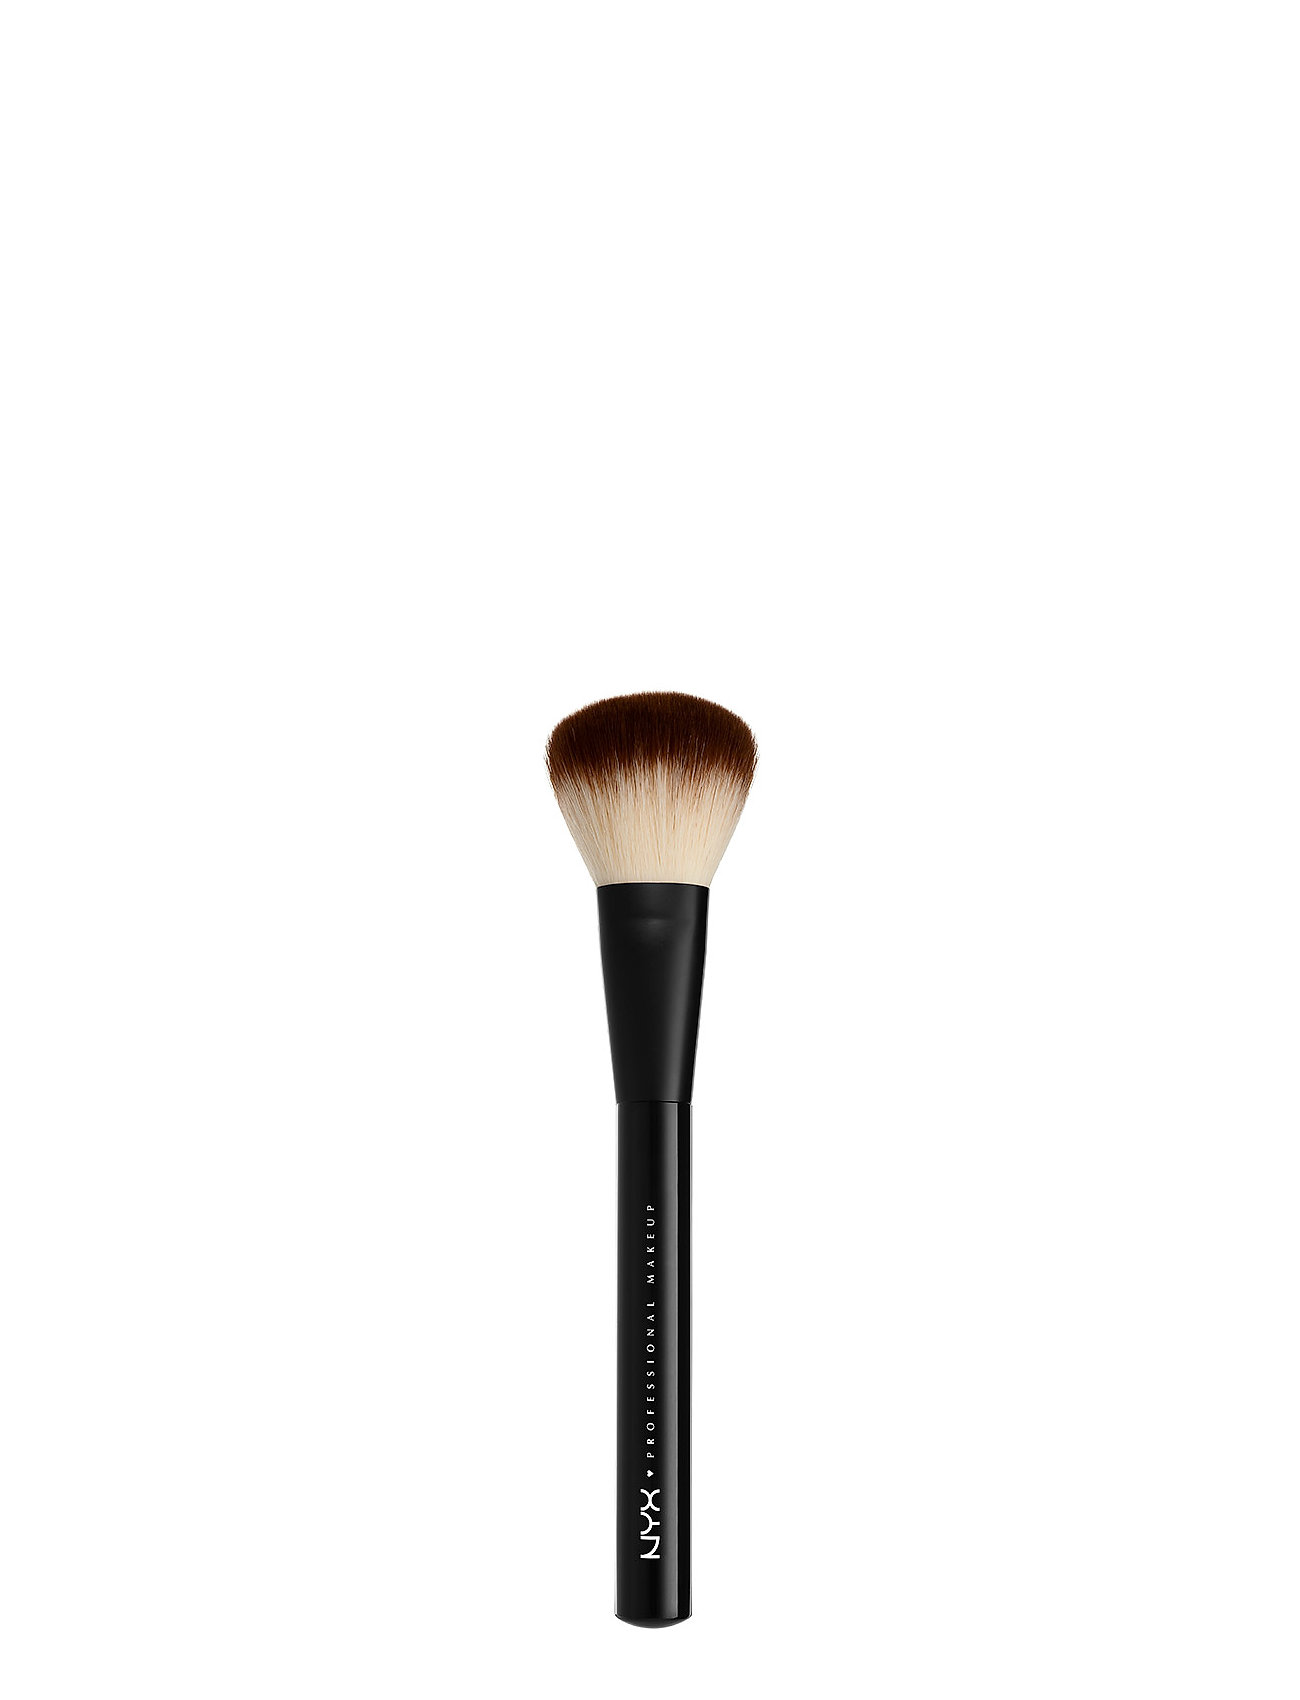 Image of Pro Powder Brush Beauty WOMEN Makeup Makeup Brushes Face Brushes Nude NYX PROFESSIONAL MAKEUP (3439482251)